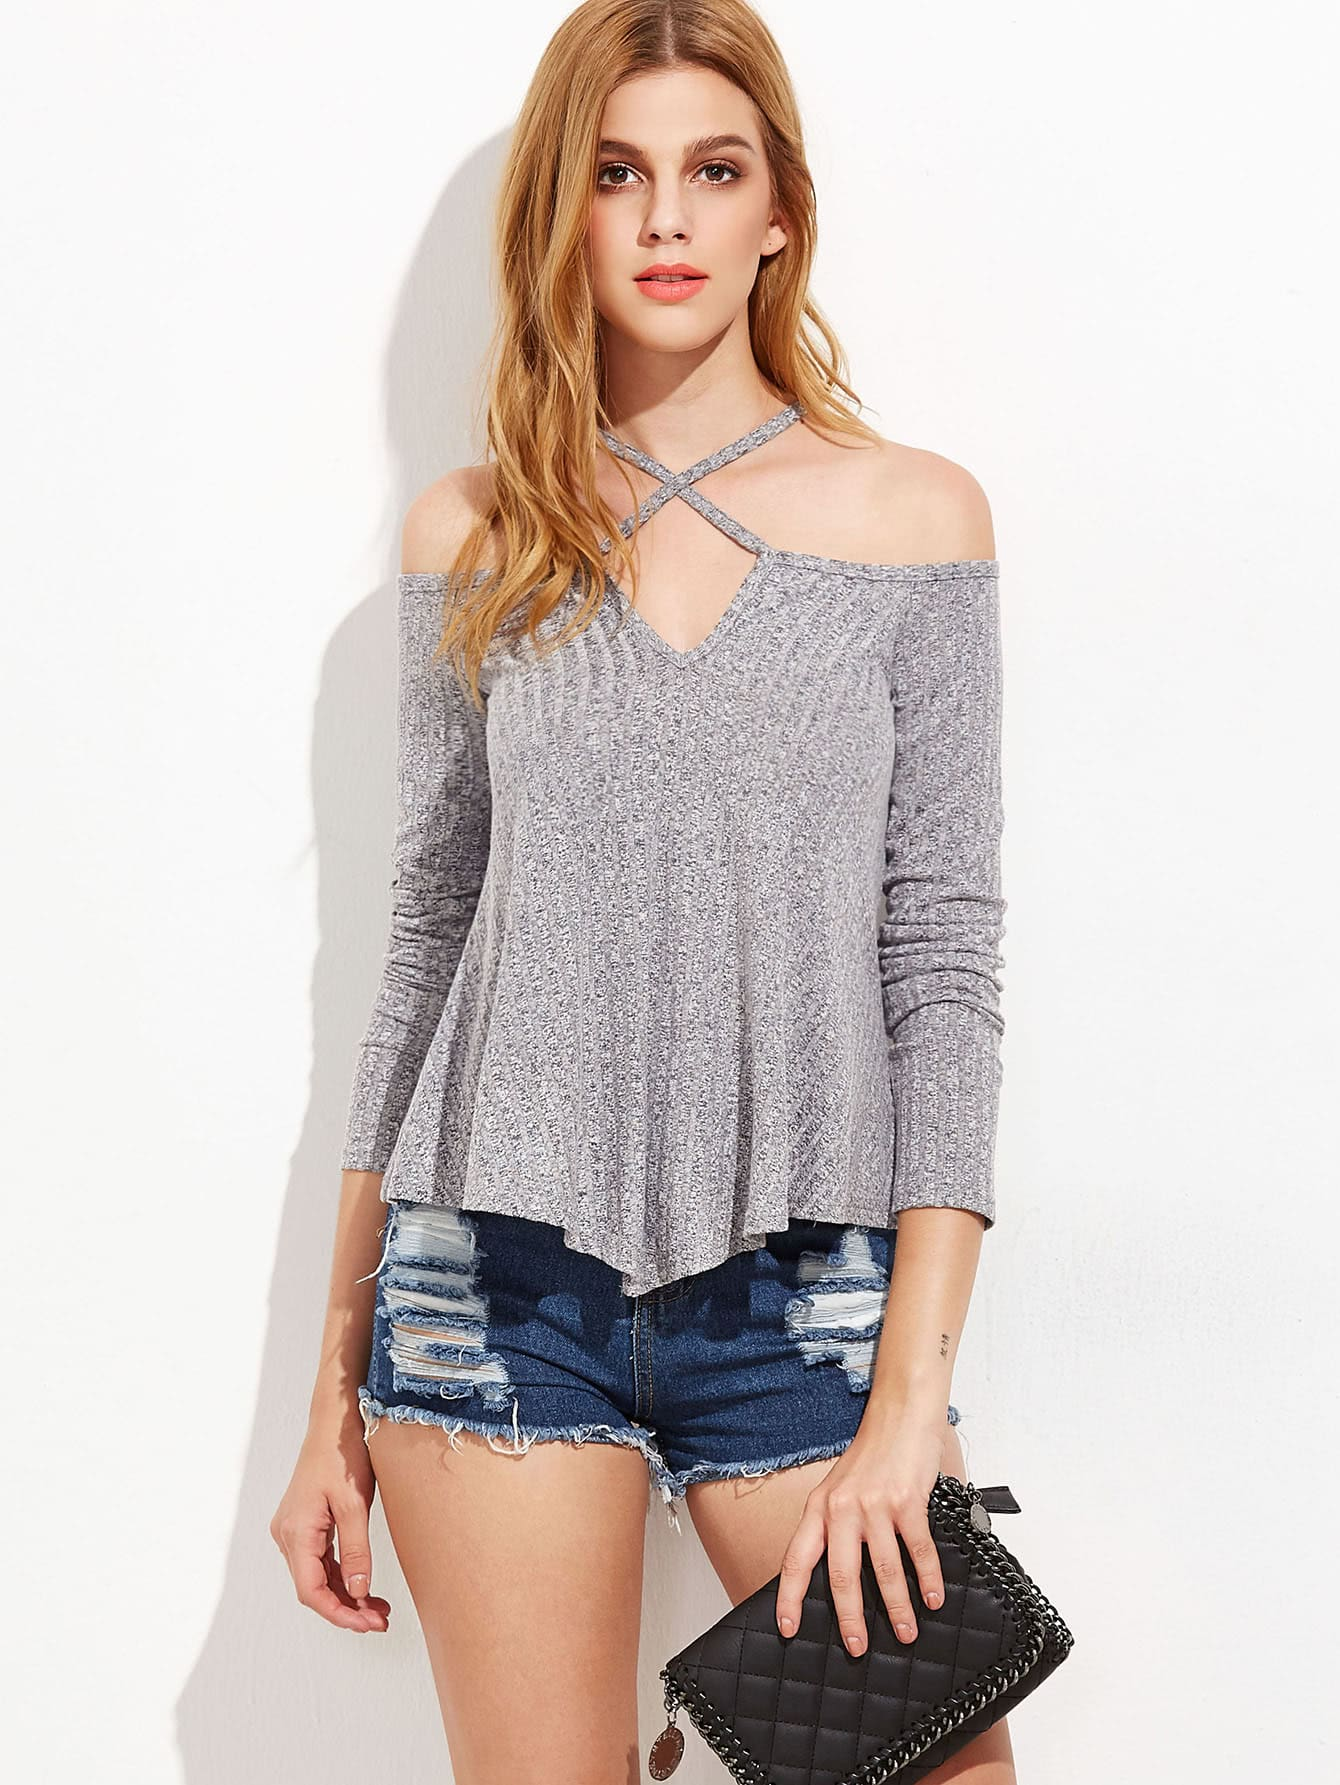 825c93cdb4ac KOZ1.com | Shop for latest women's fashion dresses, tops, bottoms.